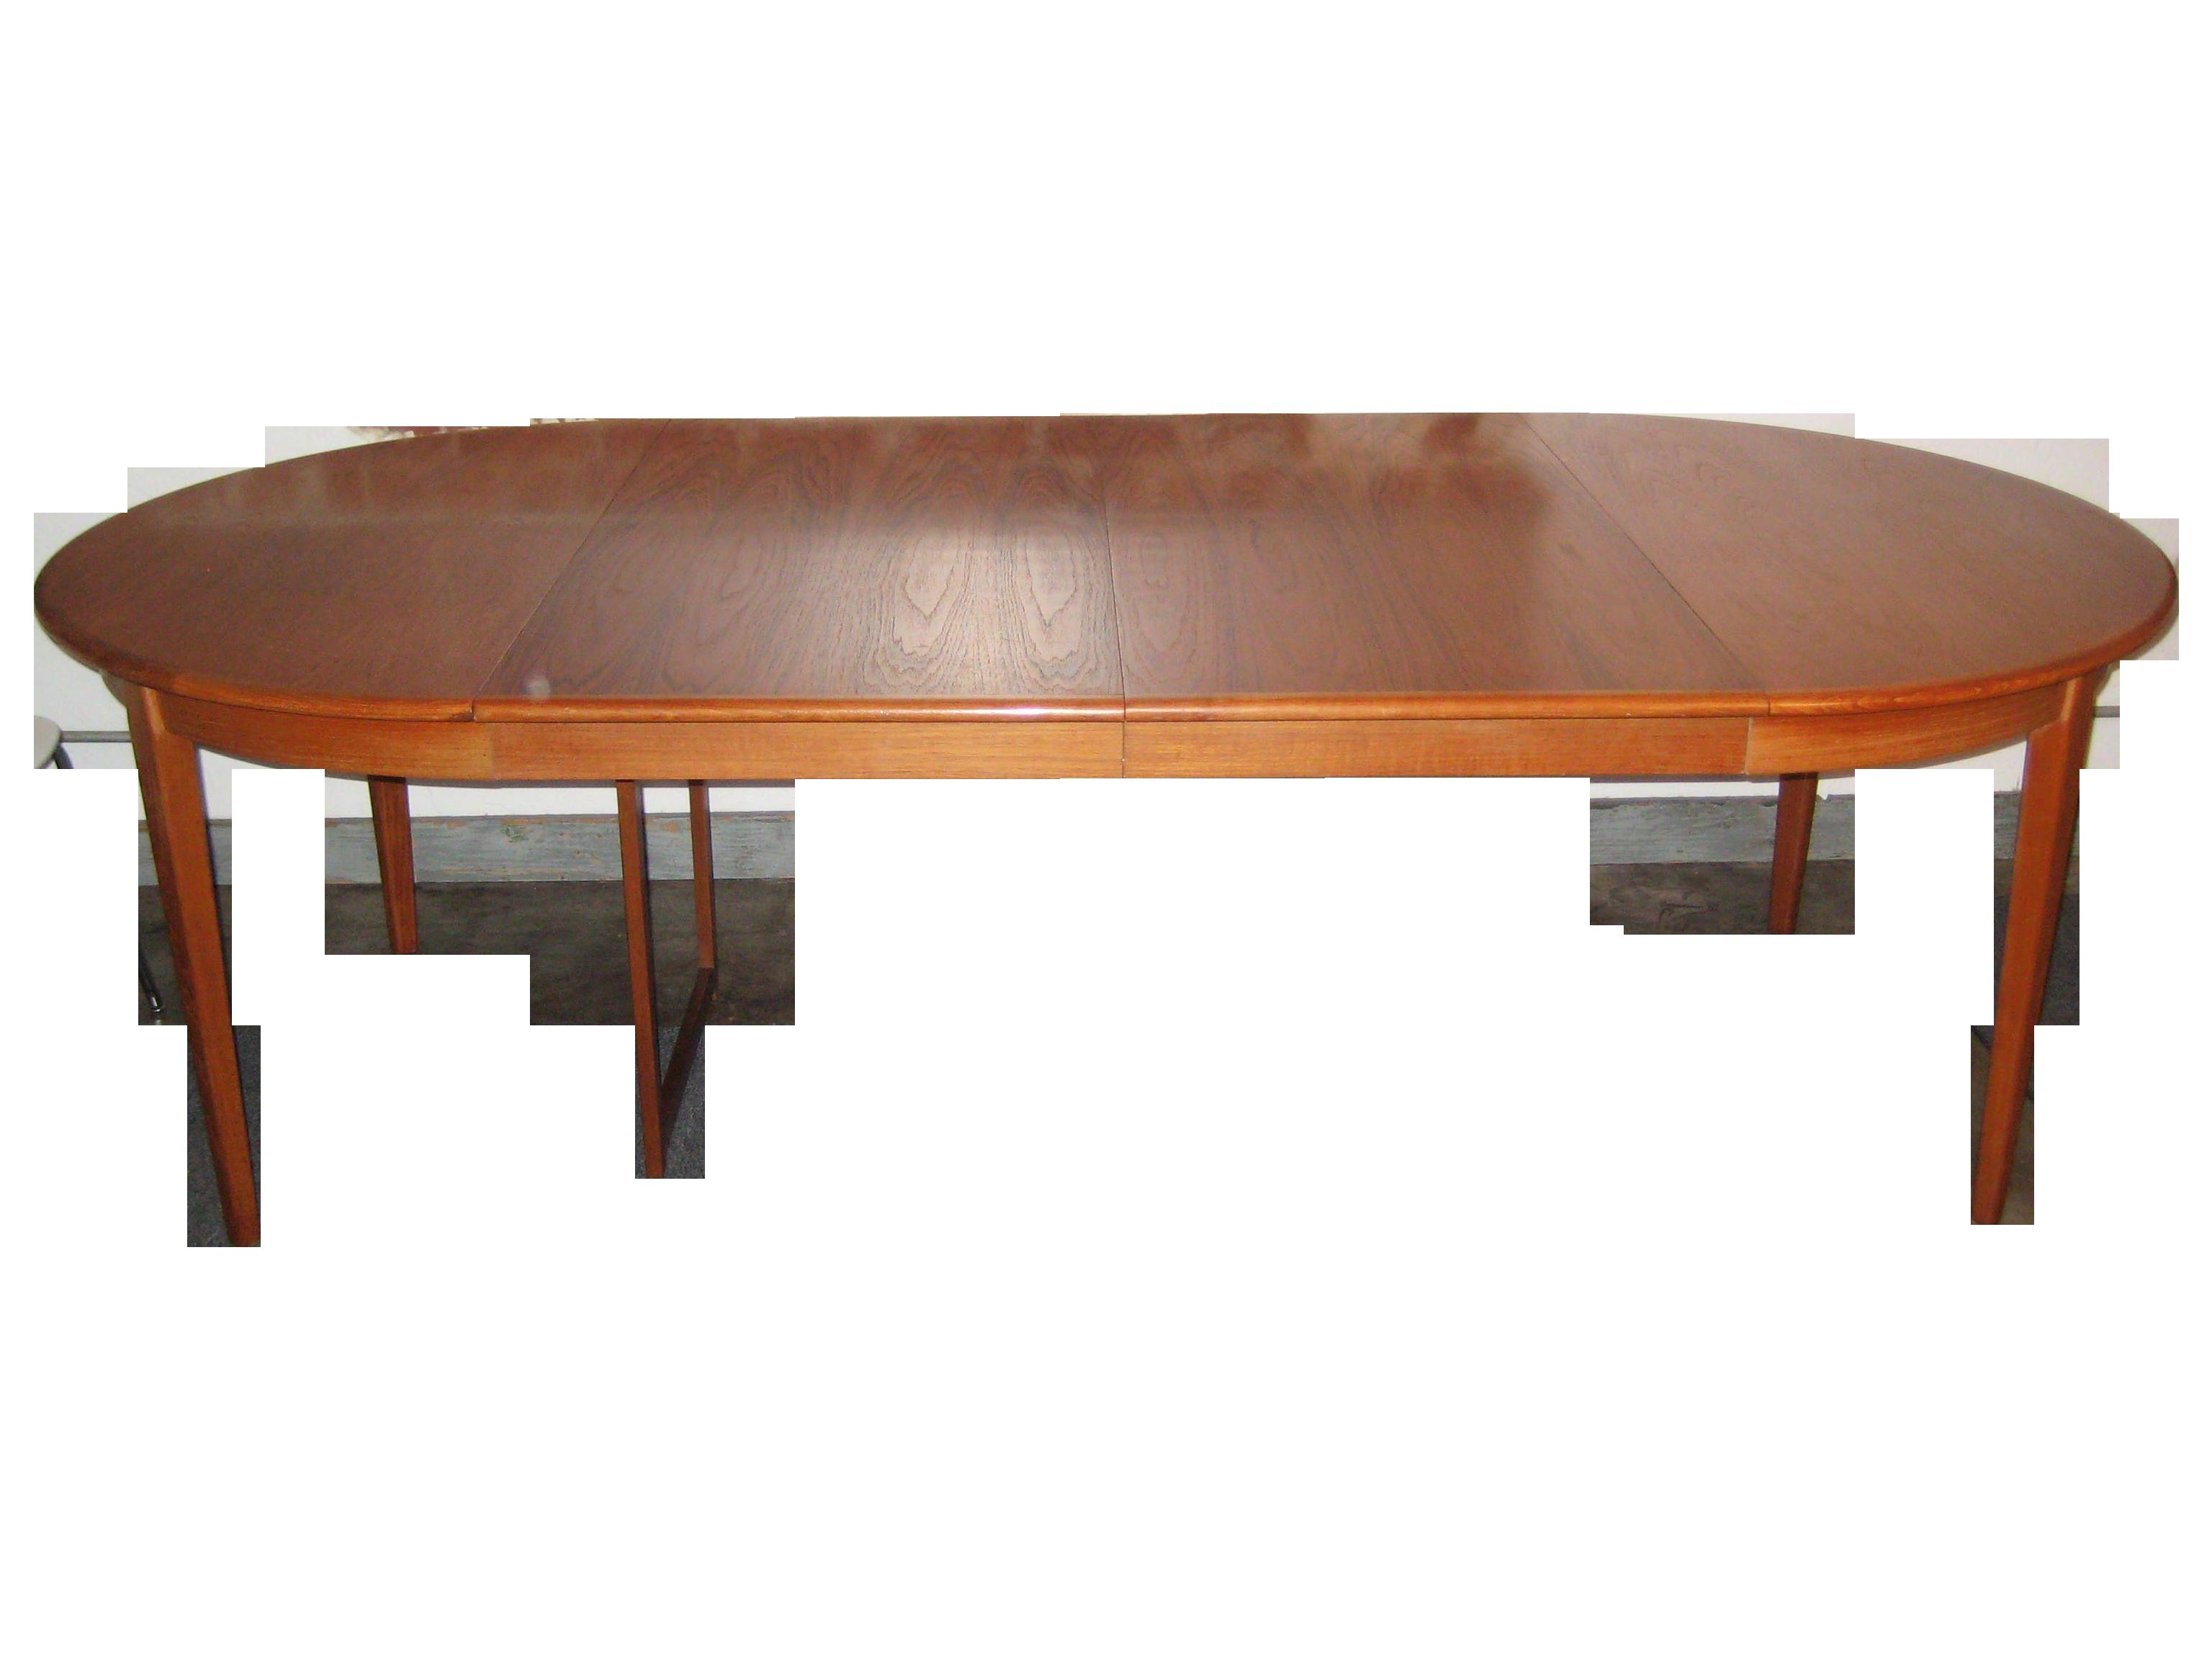 Vintage Danish Modern Dining Table H Sigh Son Danish Modern Dining Table Dining Table Vintage Danish Modern